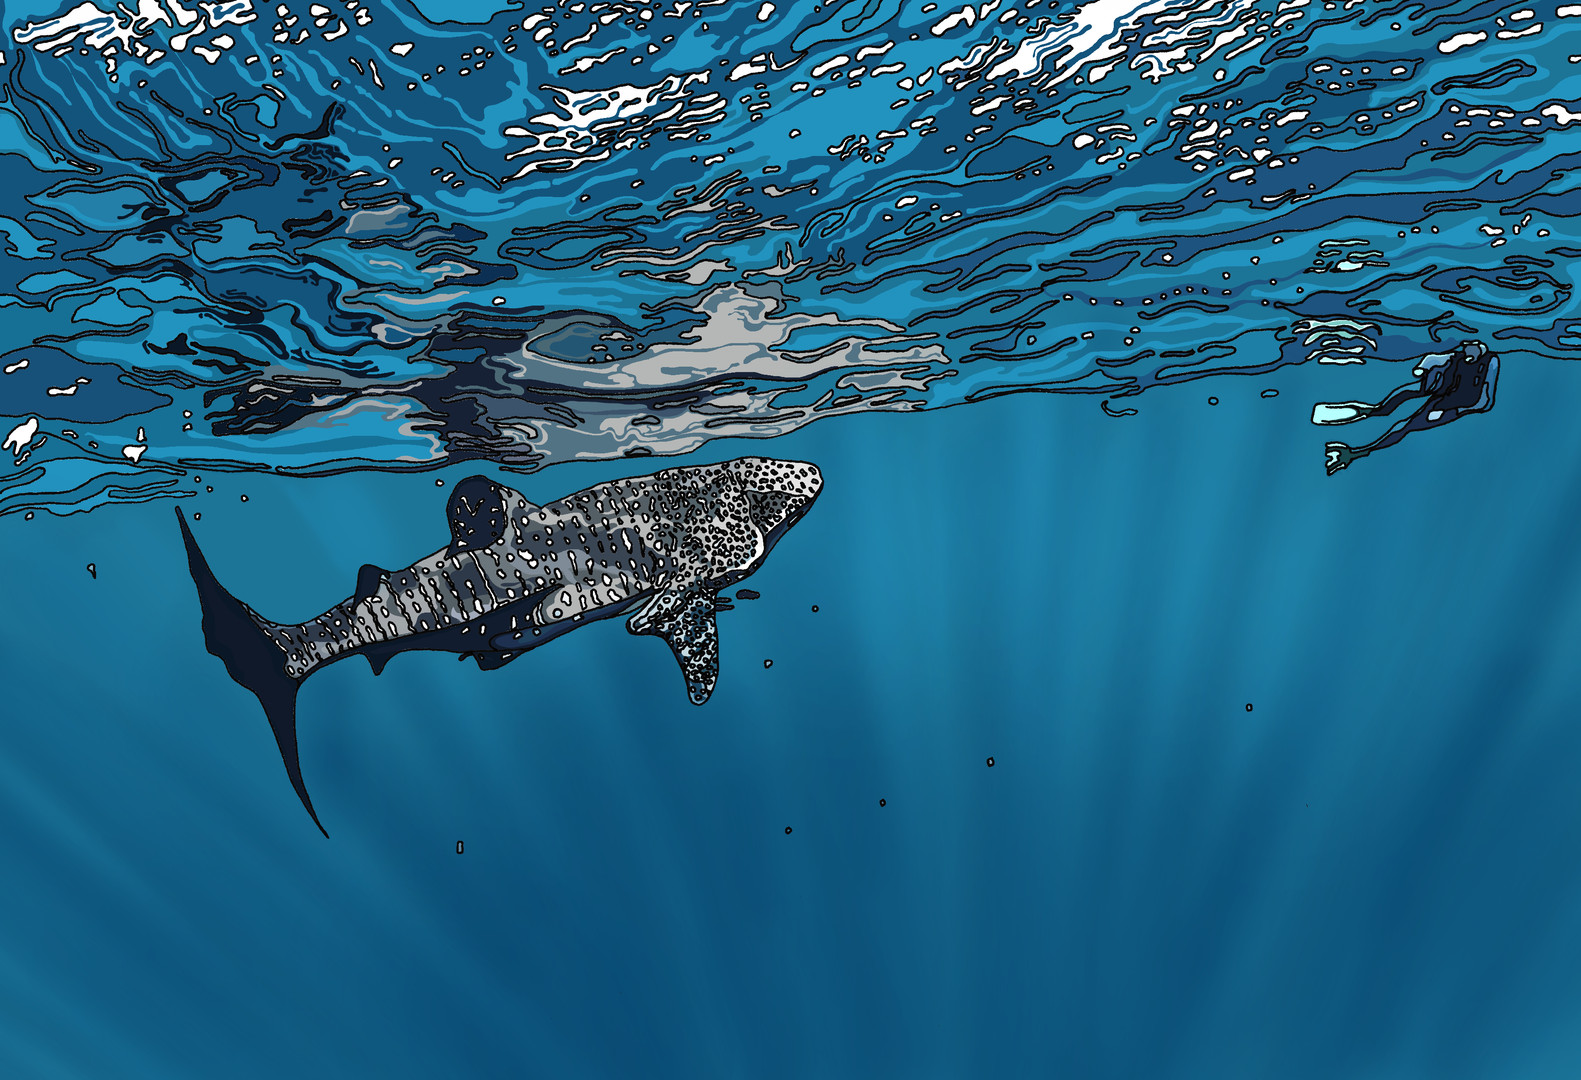 COMMISSIONED: WHALE SHARK ON THE NINGALOO COAST